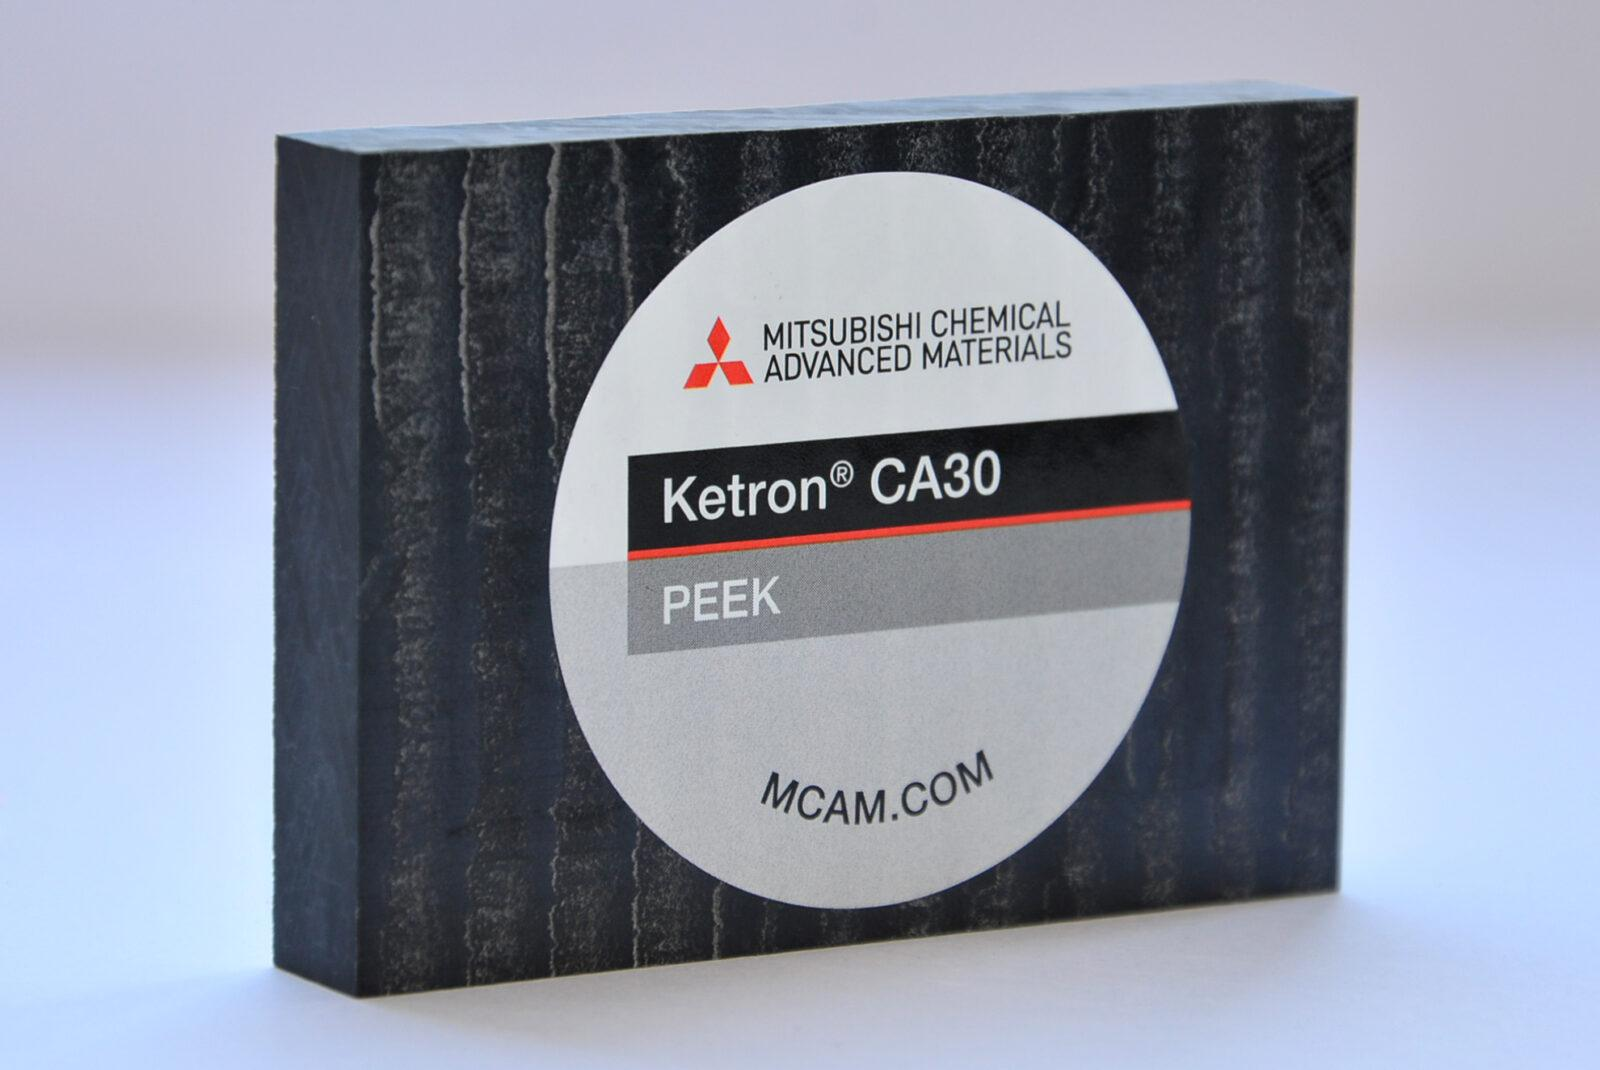 Ketron® CA30 PEEK